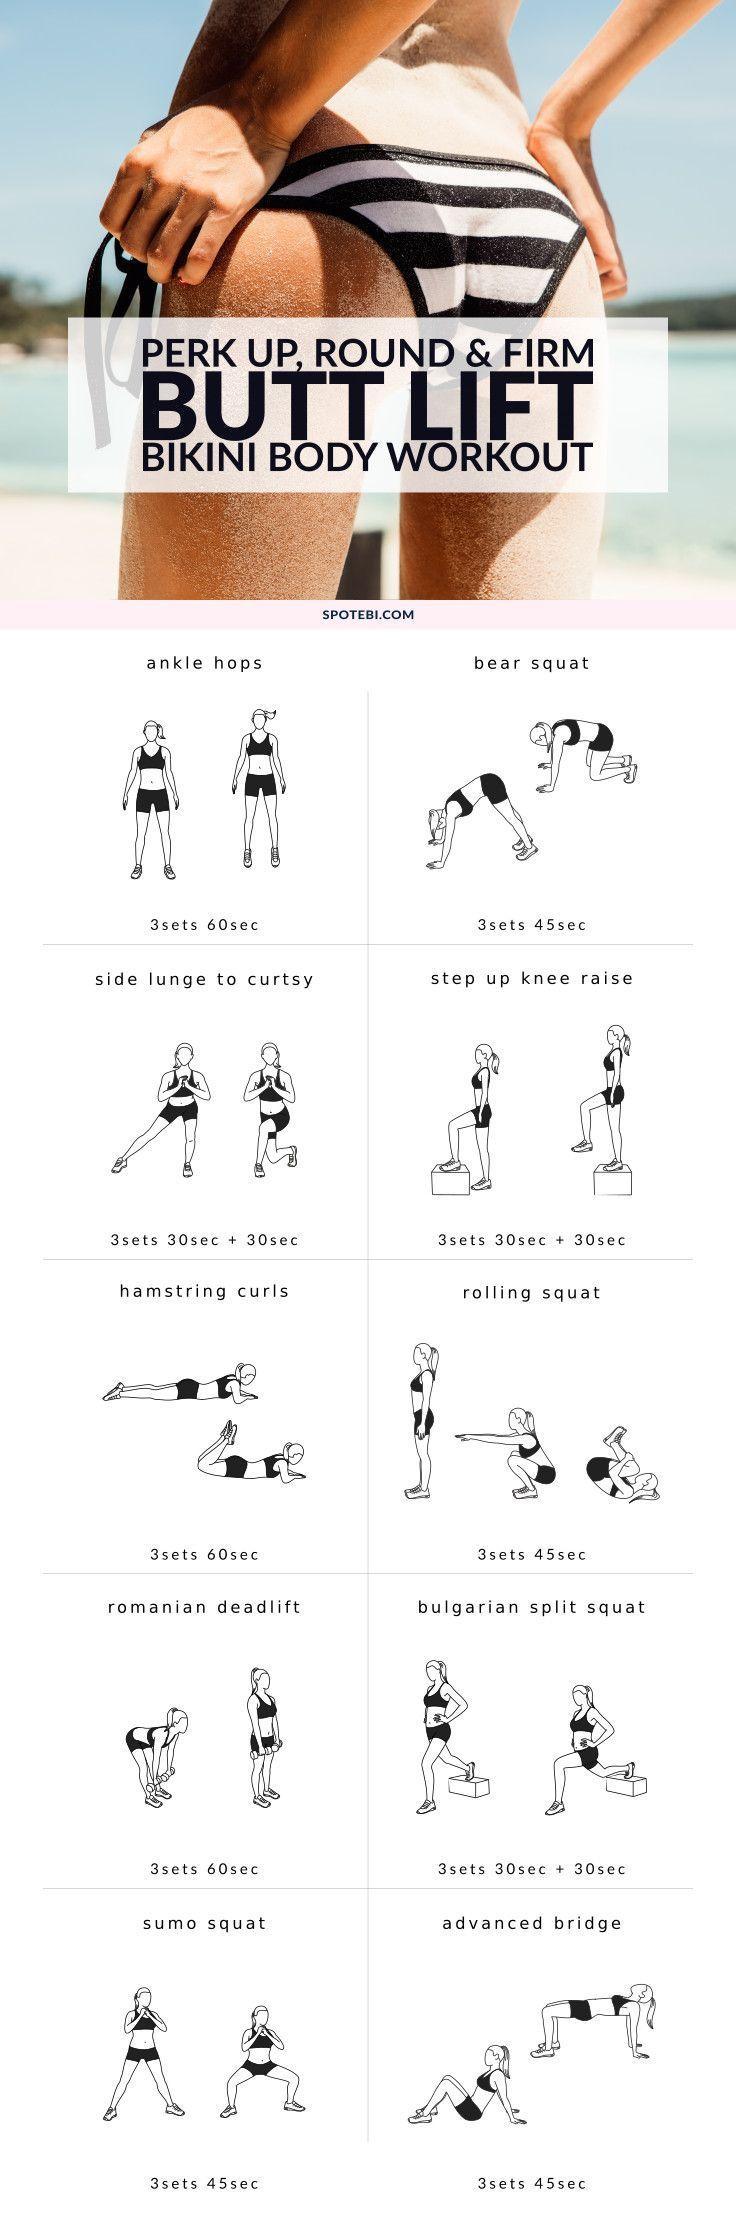 Aussie body diet and detox plan recipes image 2